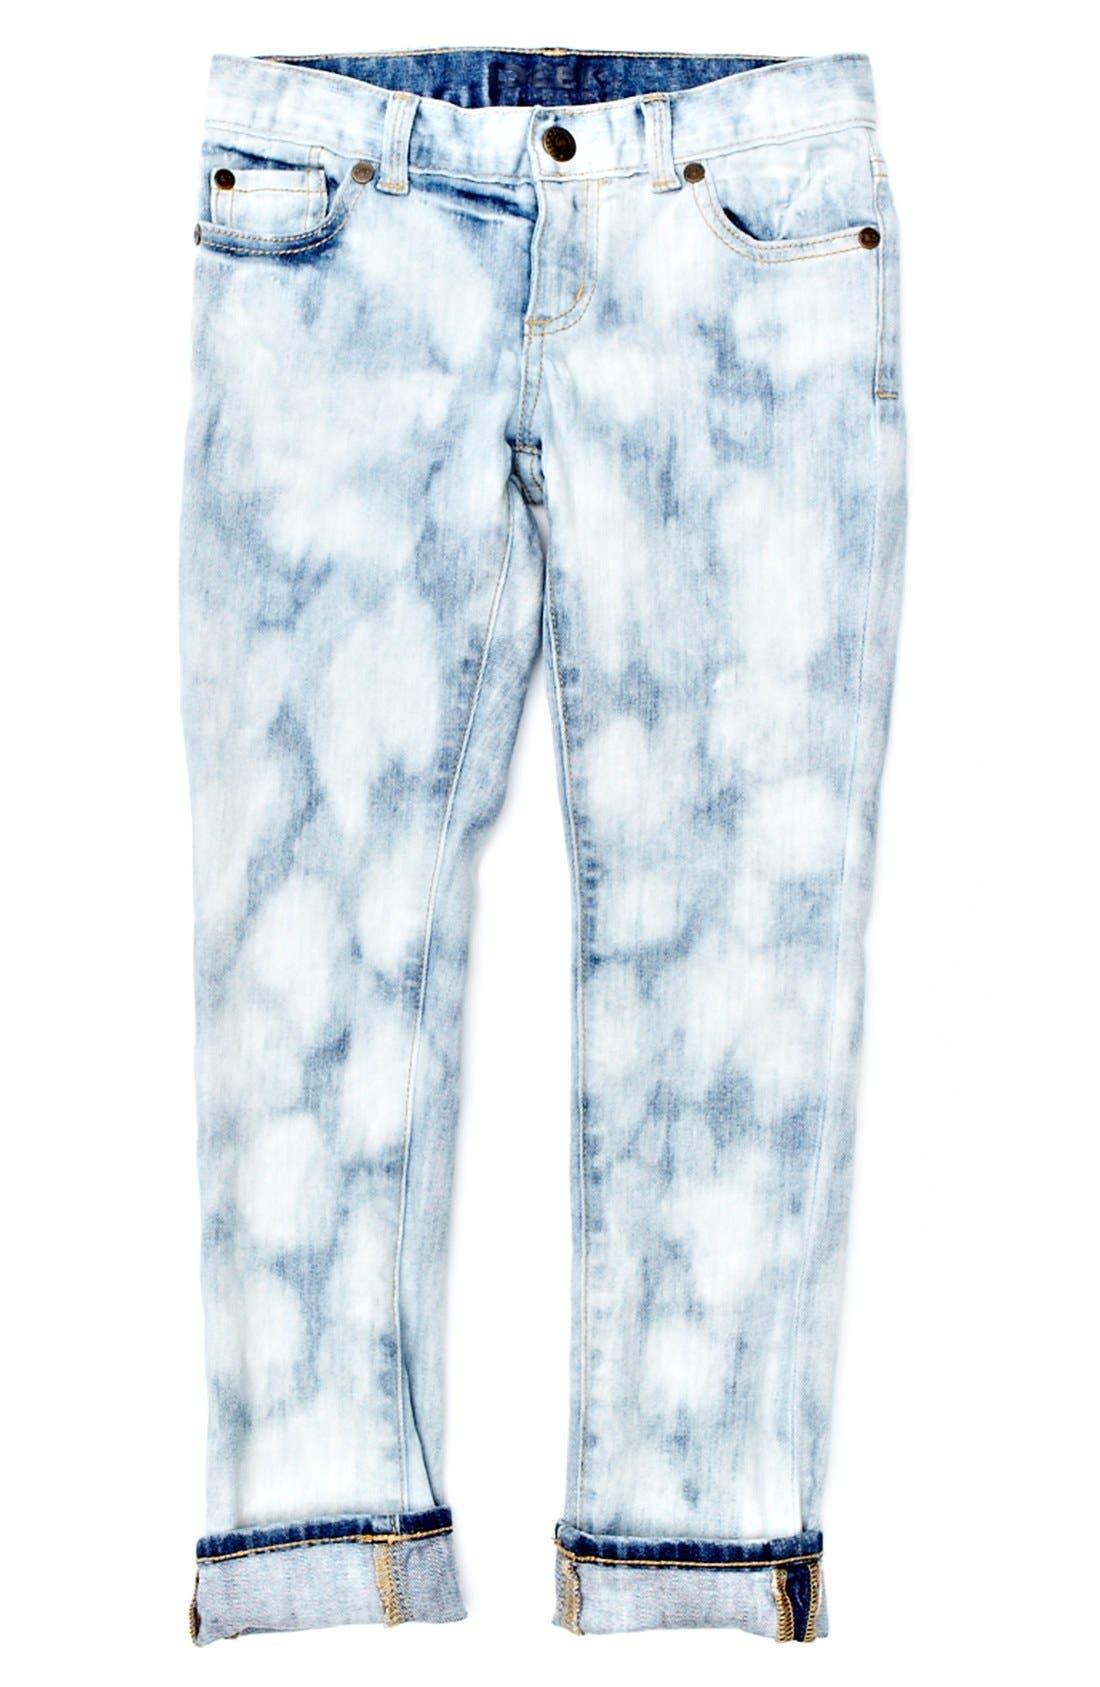 Main Image - Peek 'Audrey' Jeans (Toddler Girls, Little Girls & Big Girls)